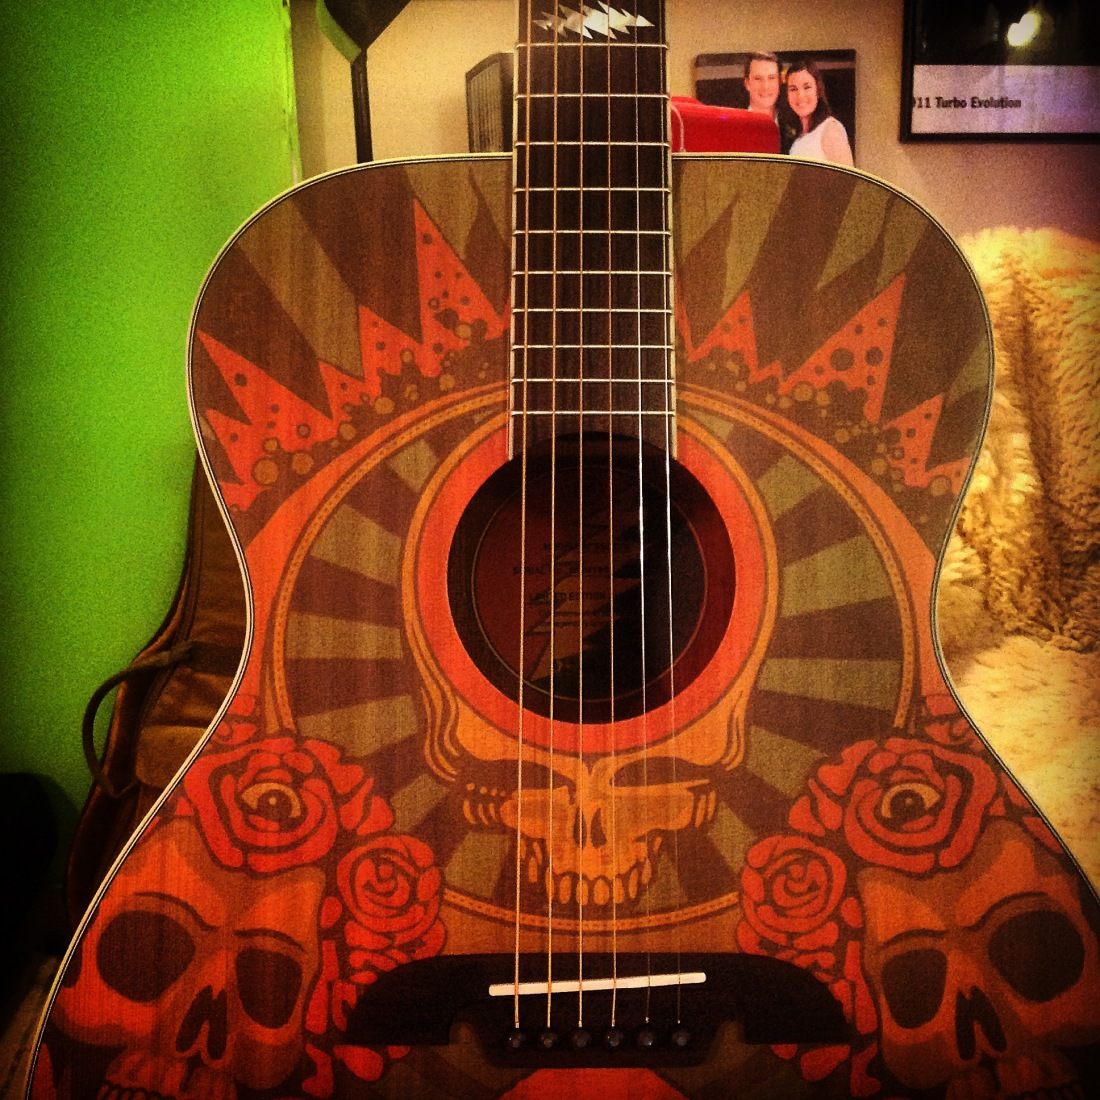 Alvarez 5th anniversary acoustic guitar